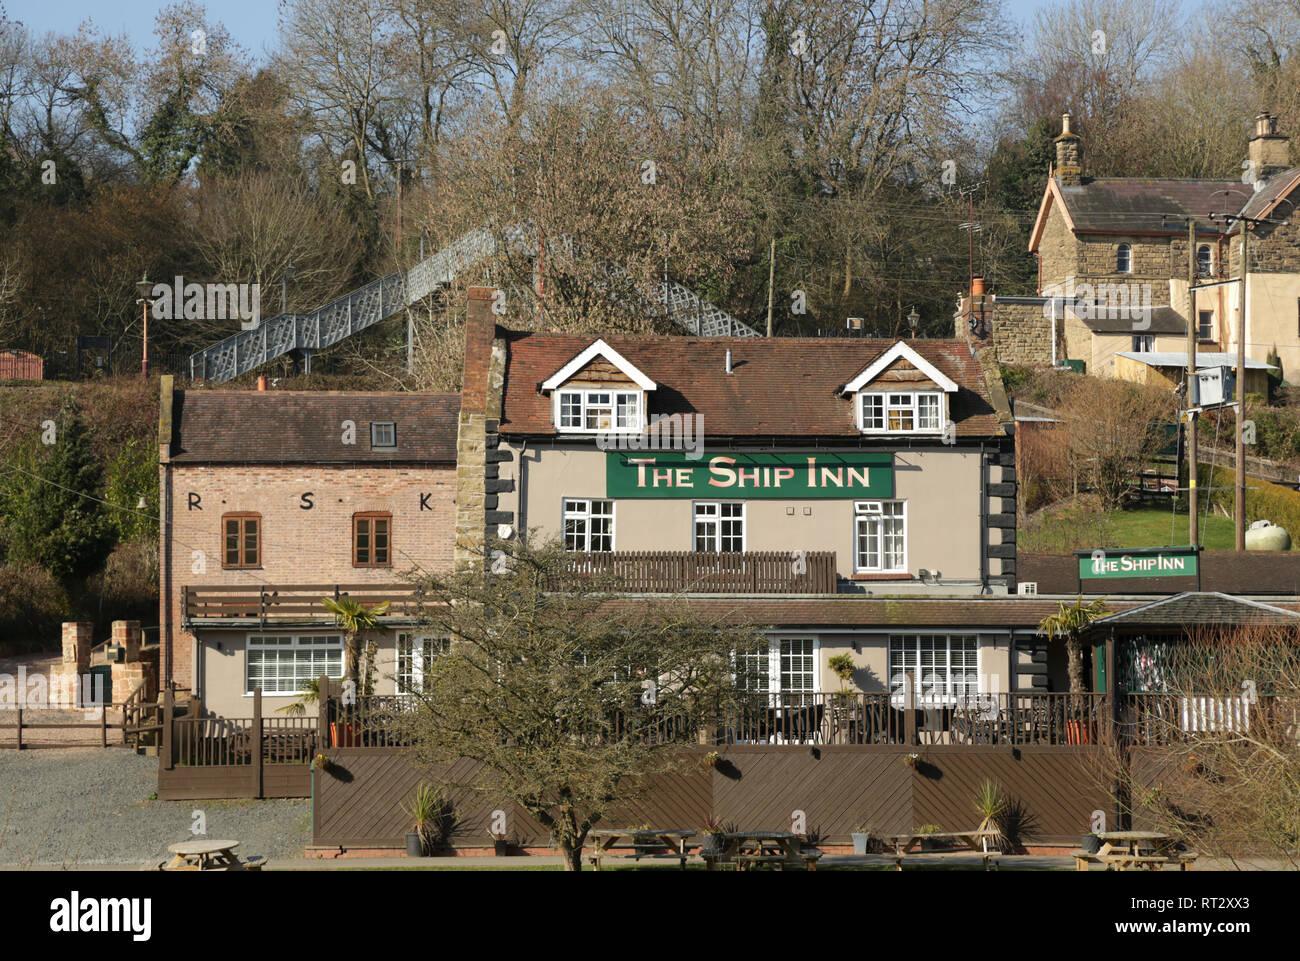 The Ship inn, Highley, Bridgnorth, Shropshire, England, UK. - Stock Image